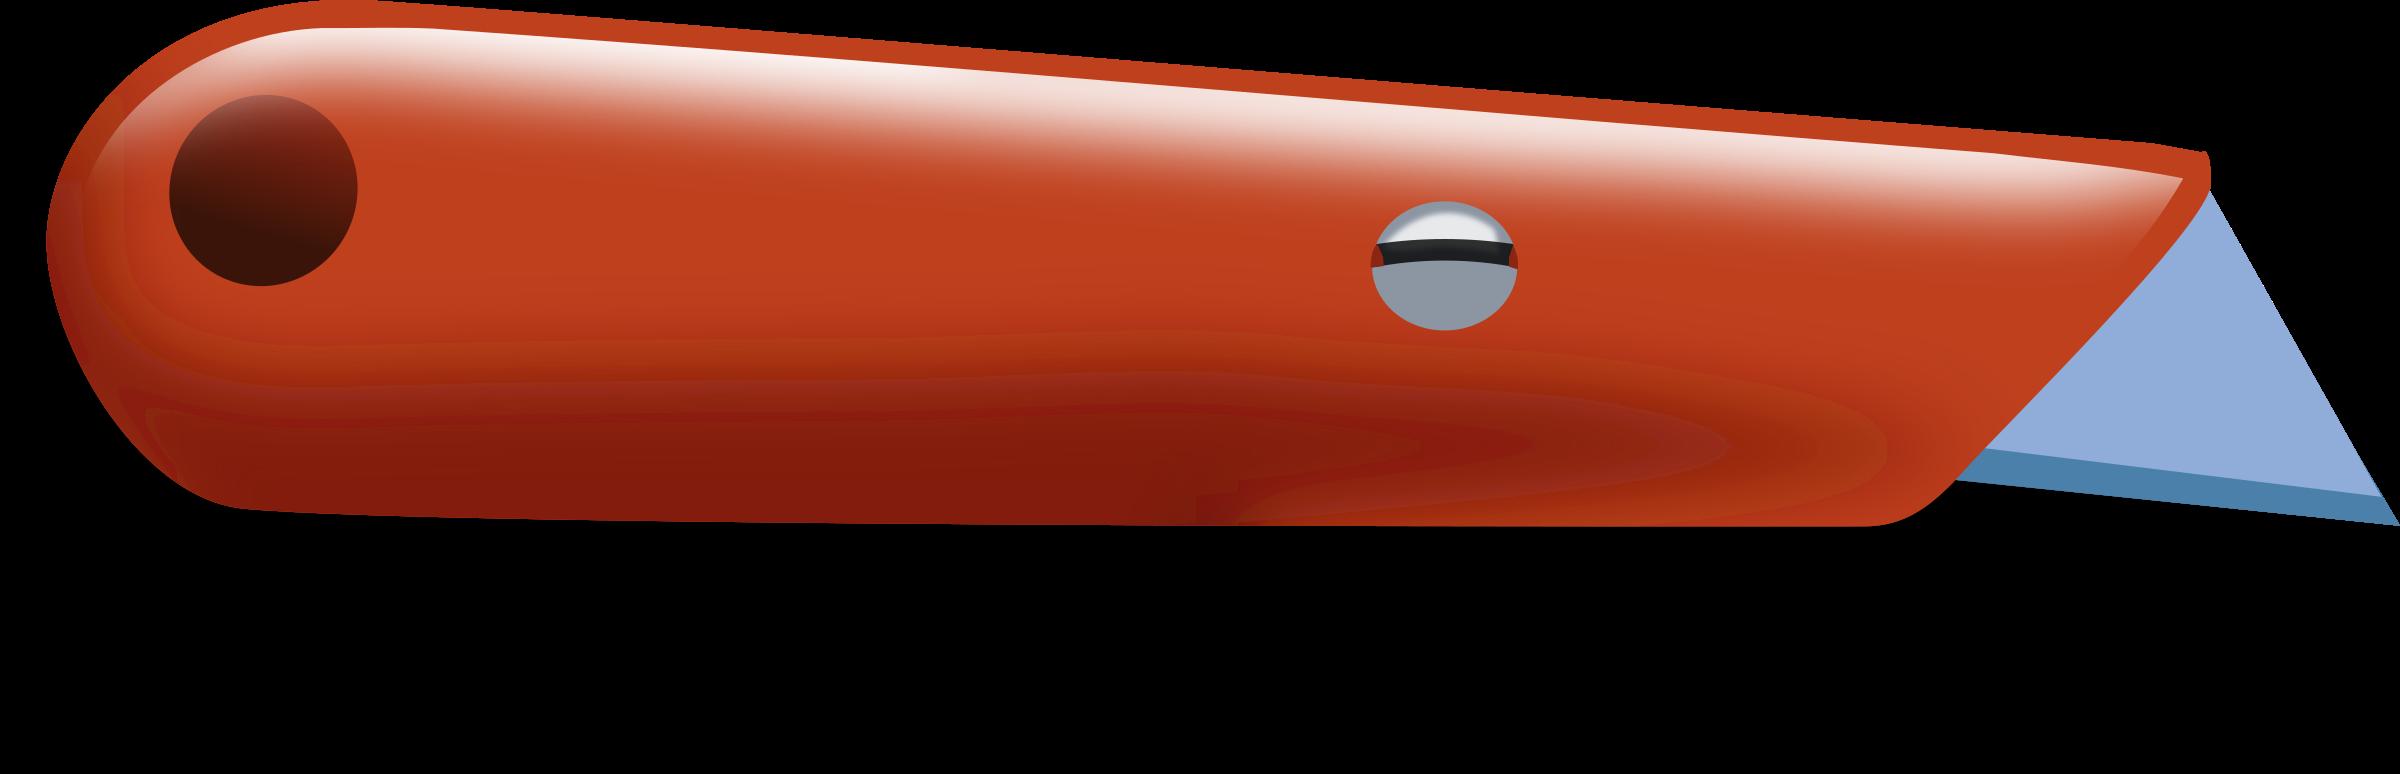 Khife clipart orange Knife Craft Knife Clipart Craft